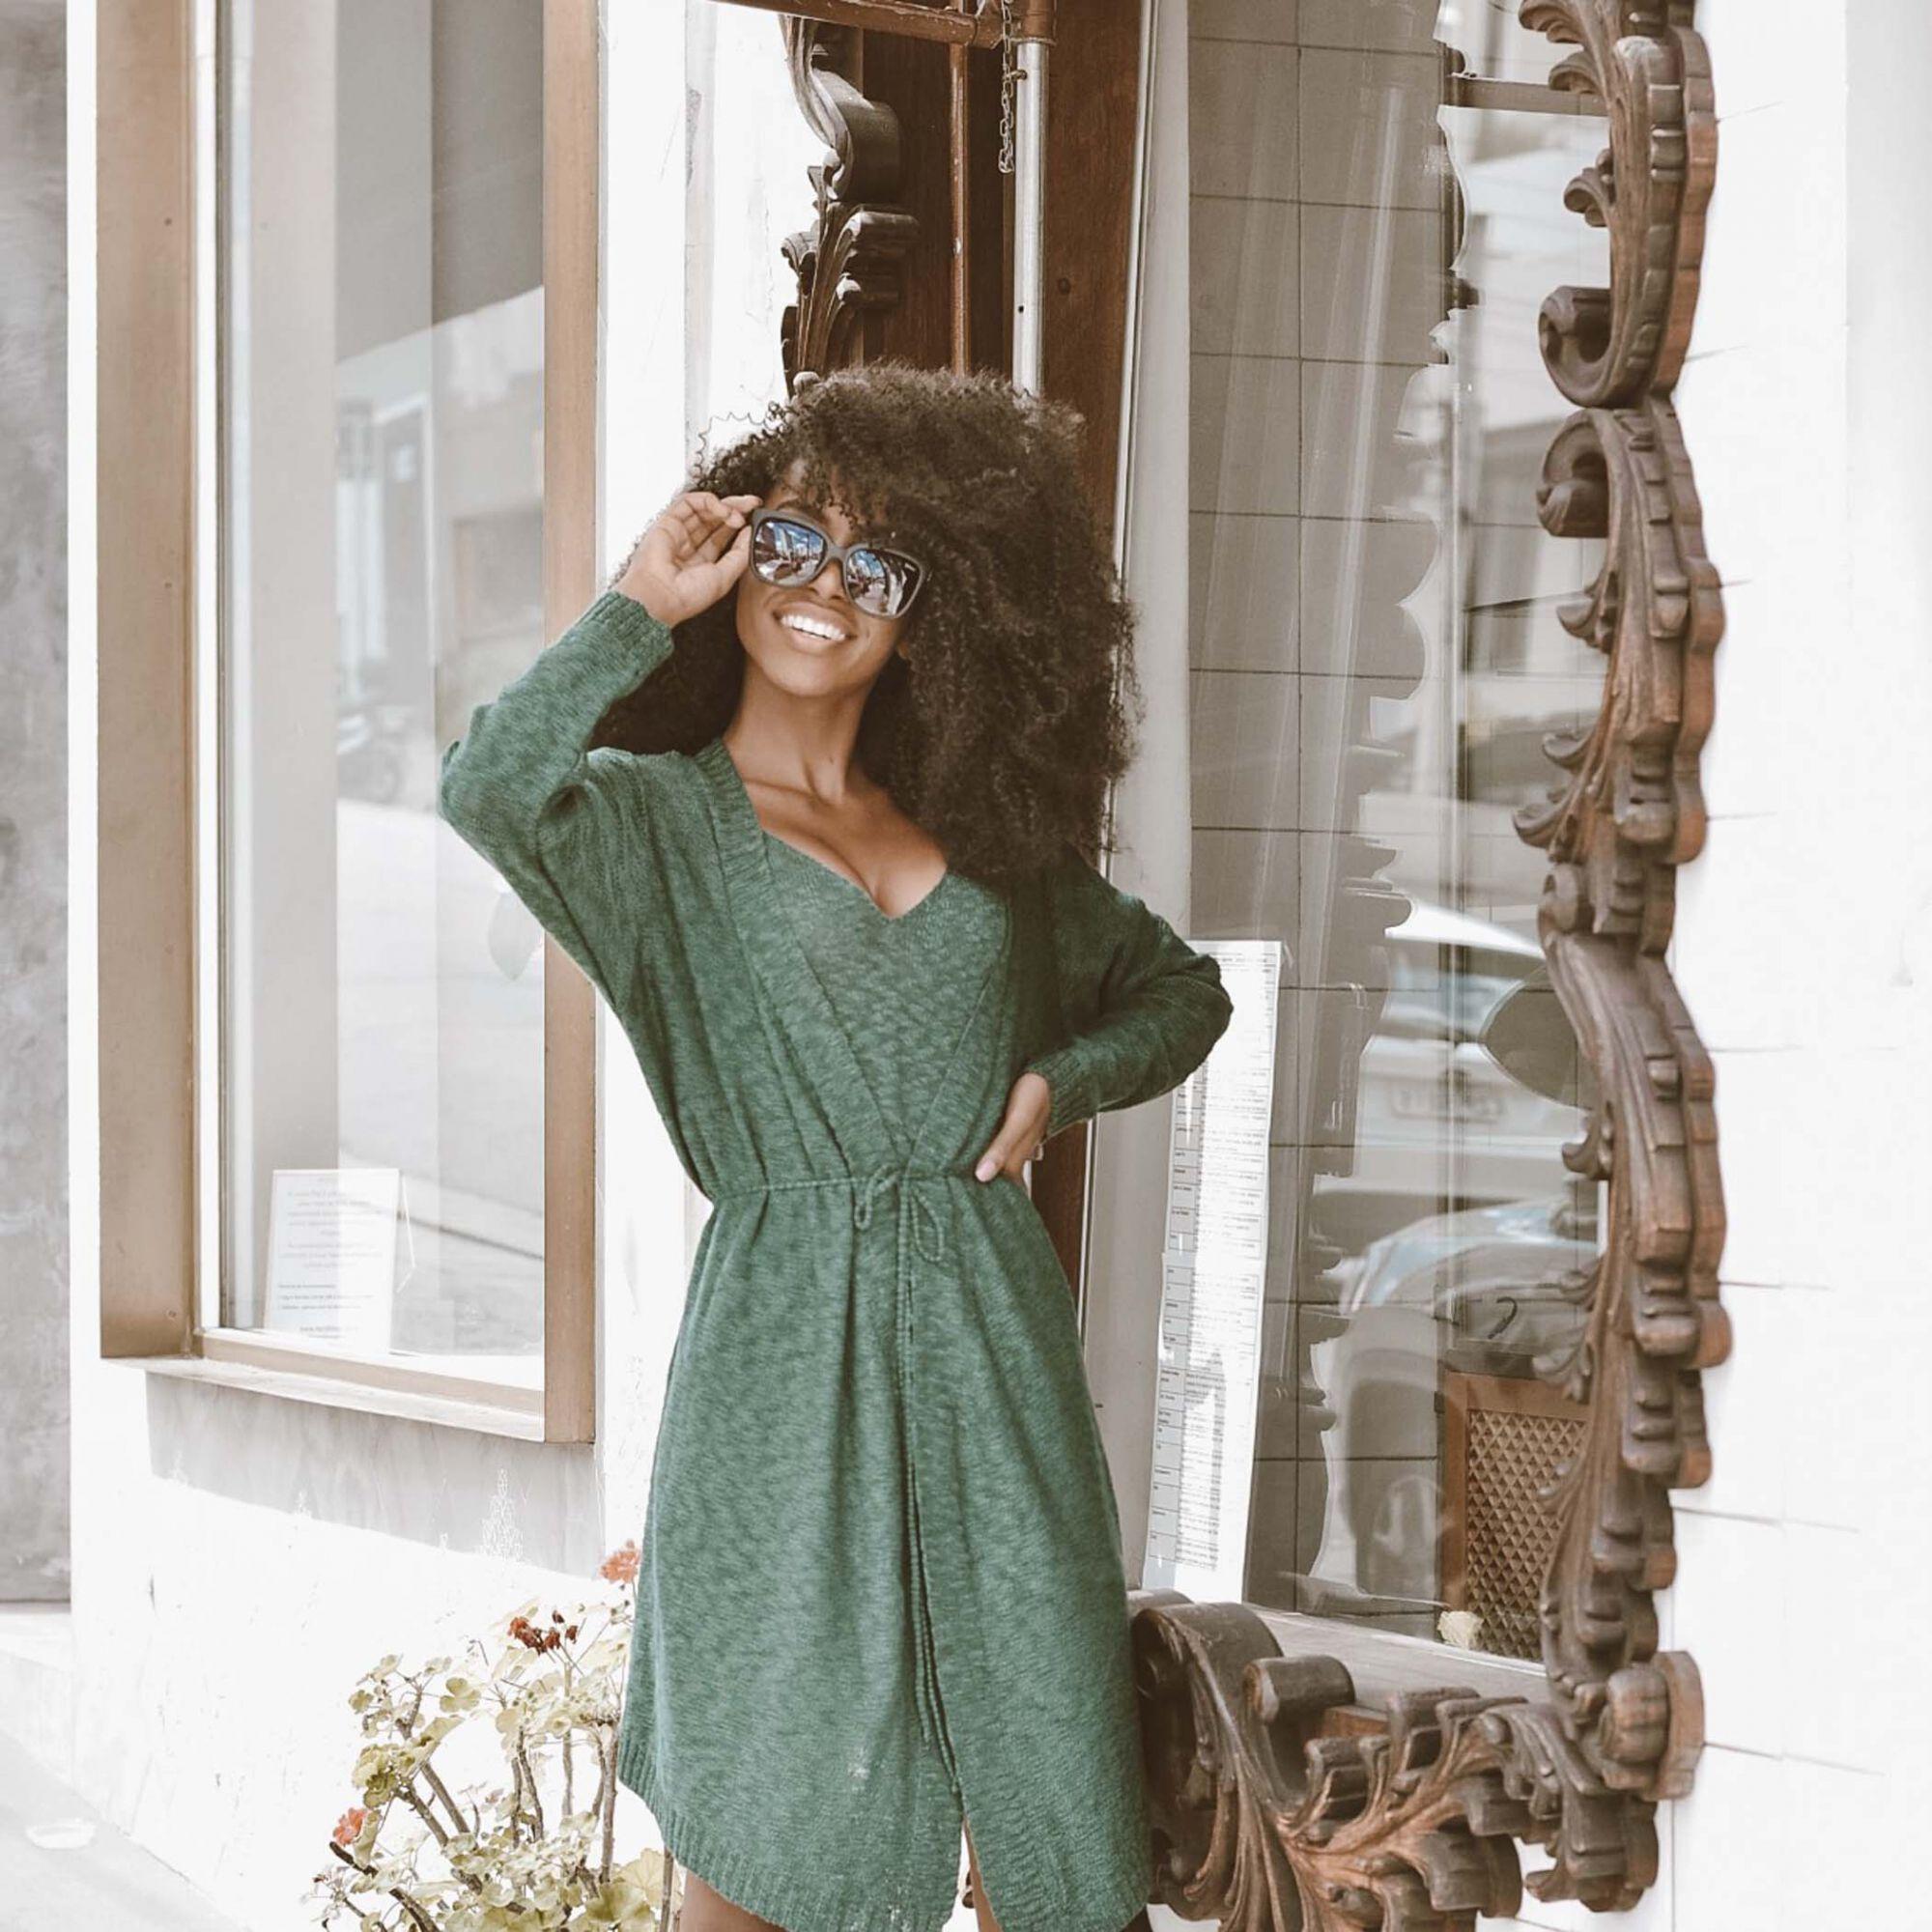 Casaco Vera Tricot Manga Longa Feminino Cordão Verde